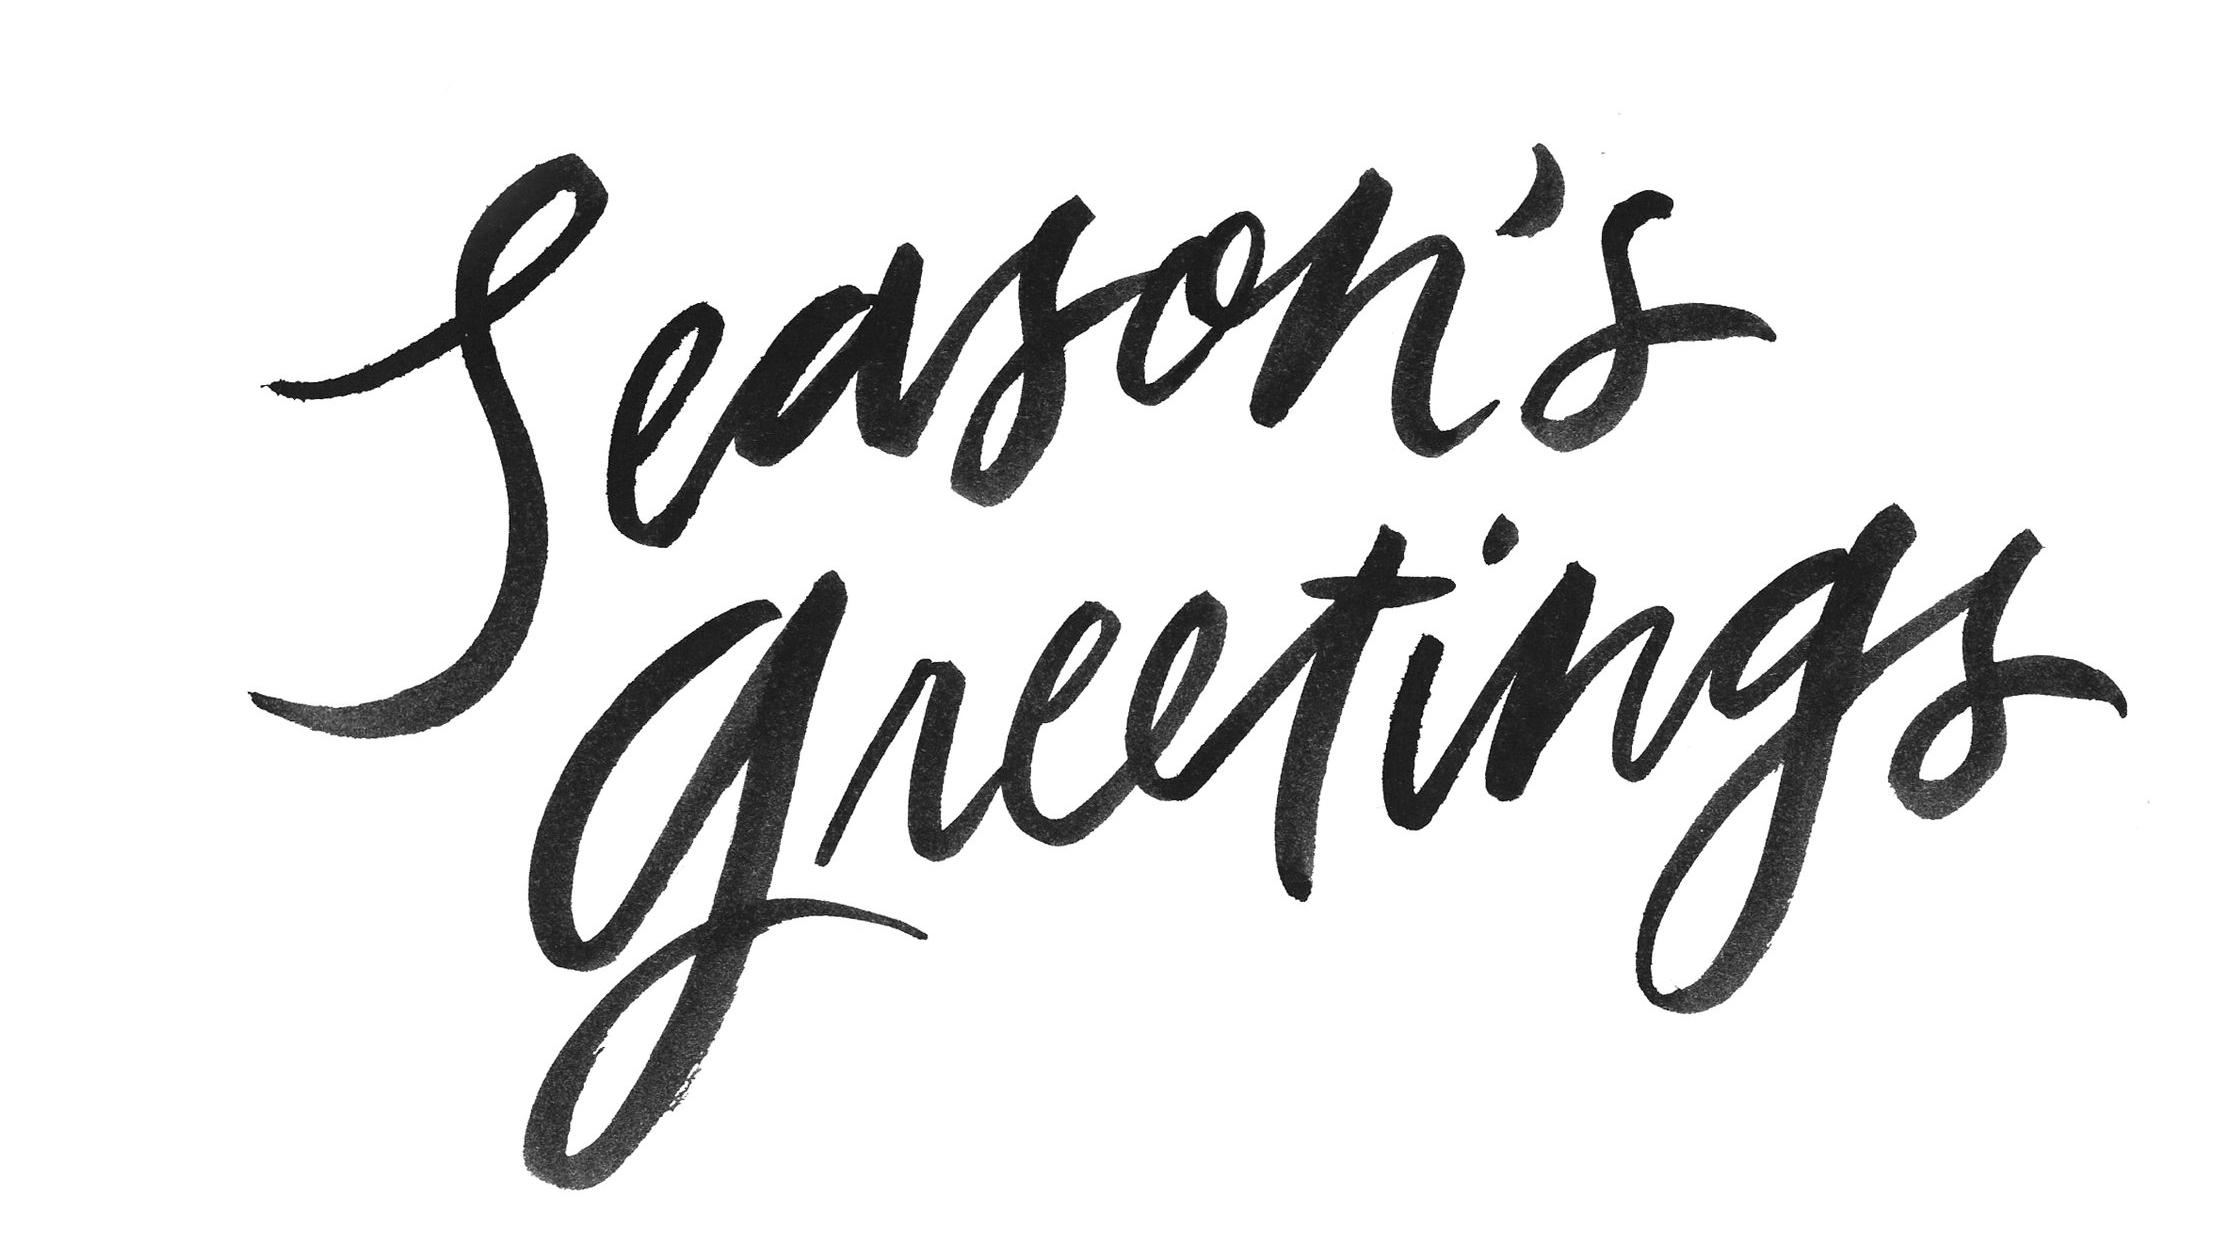 seasons greetings mini2.jpg